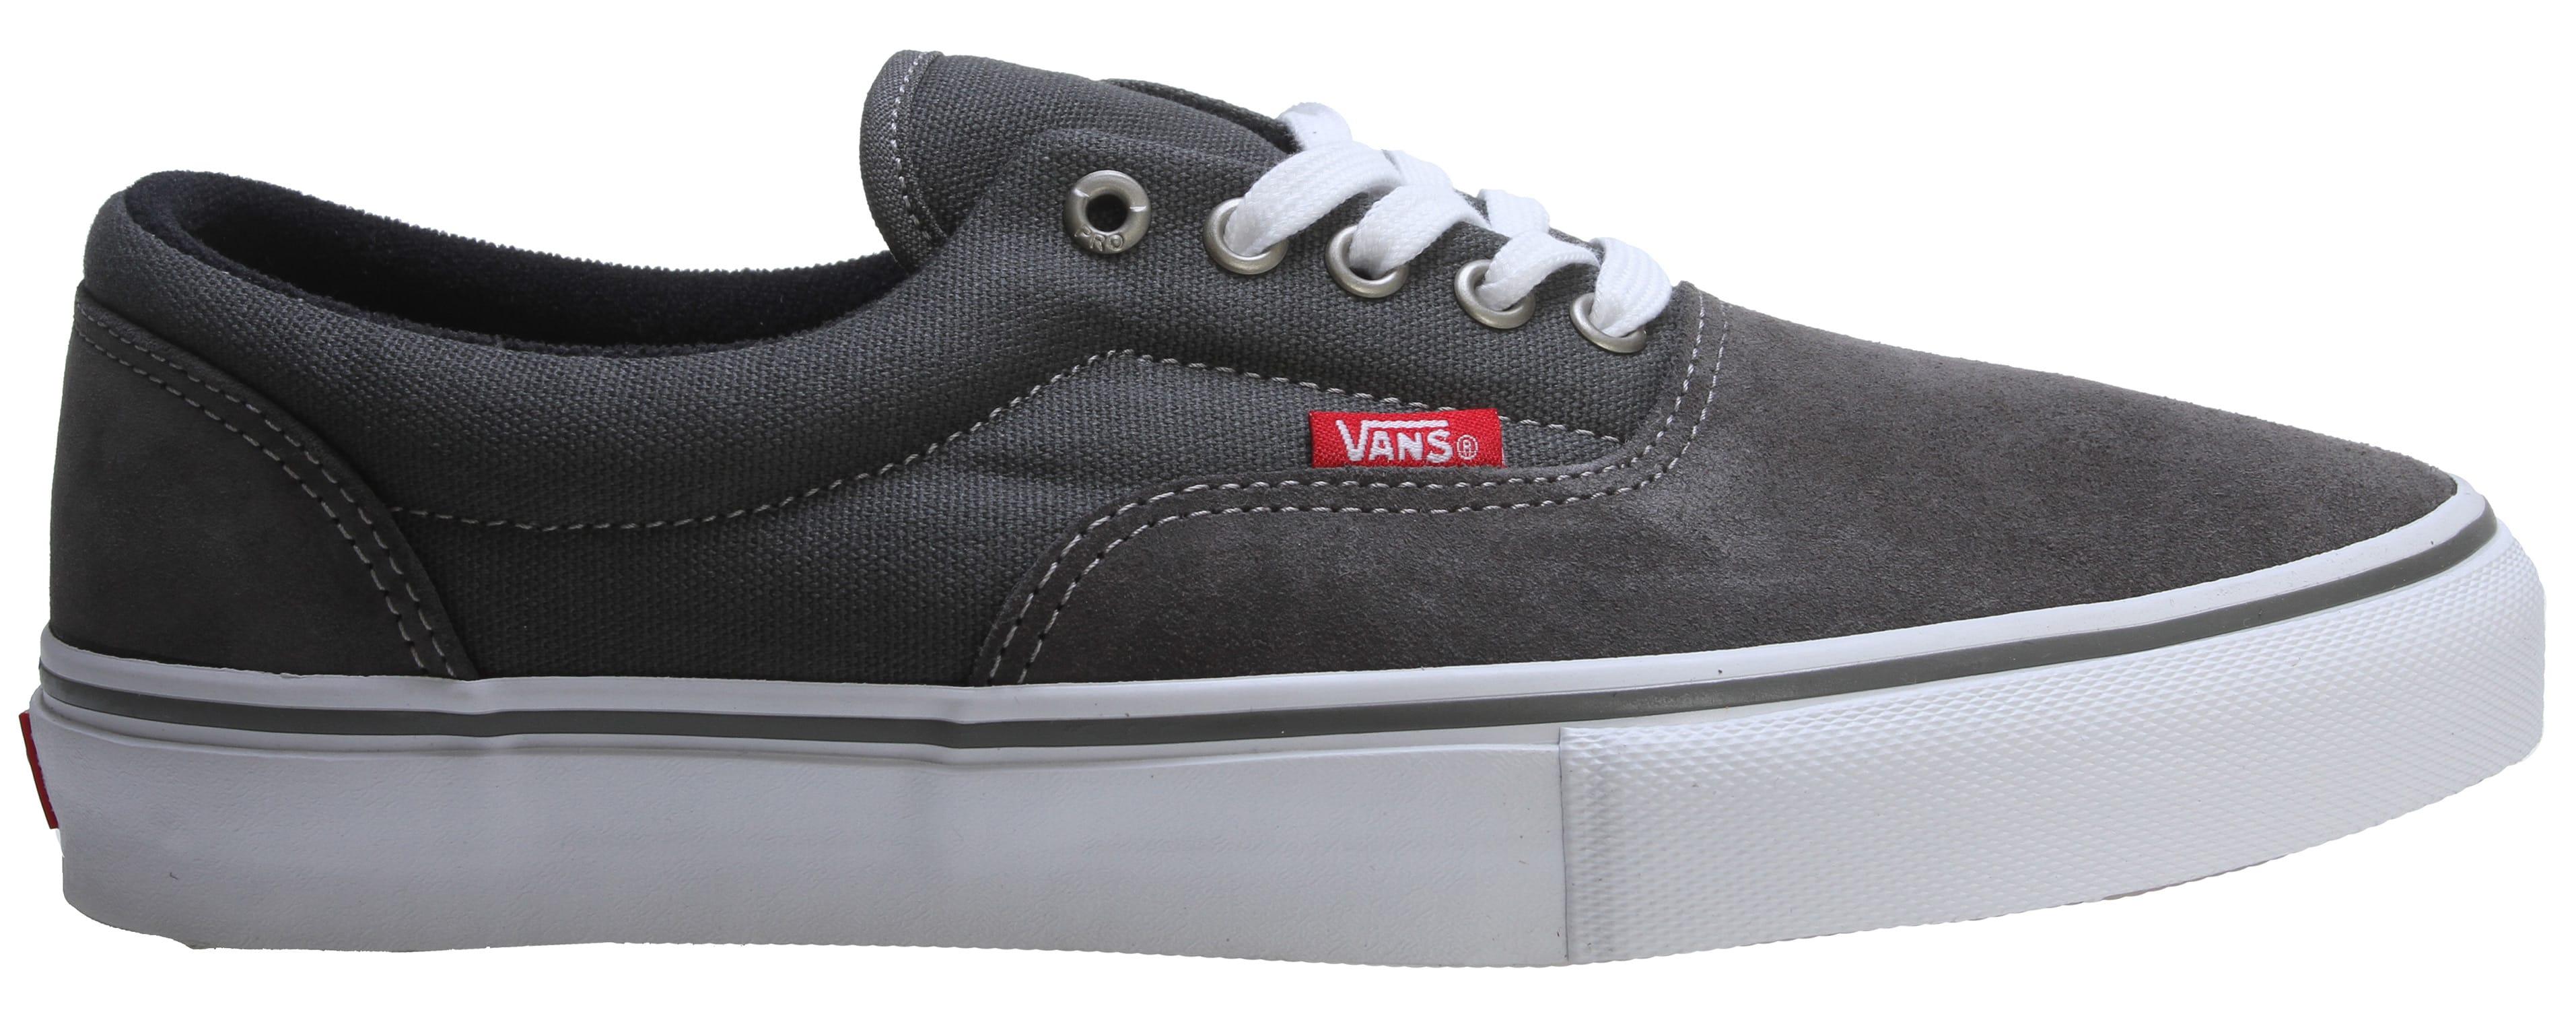 Vans Era Laceless Pro Skate Shoes - thumbnail 1 058c9df43